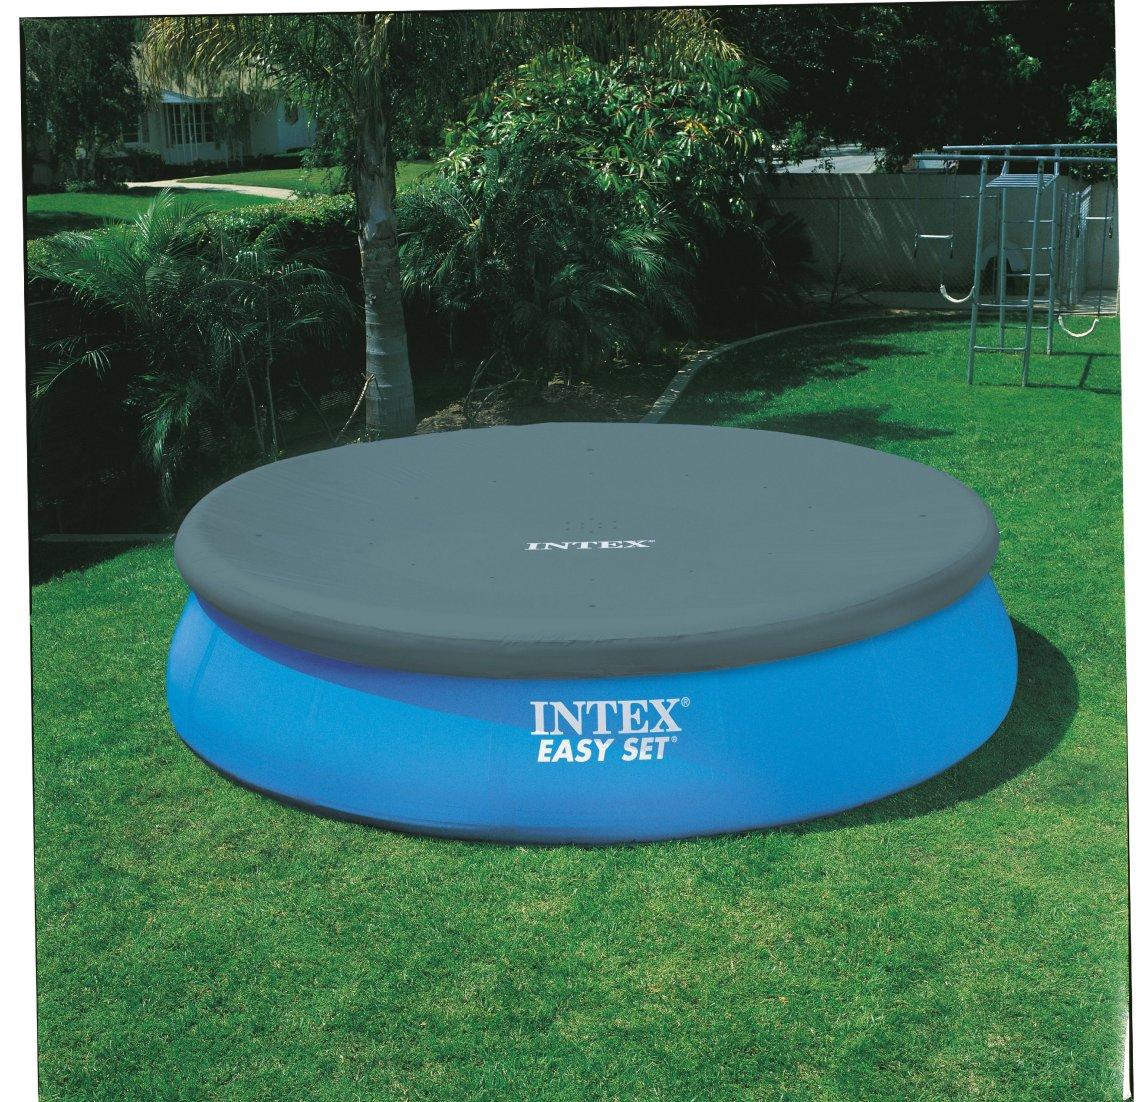 Piscina gonfiabile intex 28168 26168 easy rotonda pompa filtro scaletta - Telo copertura piscina intex ...